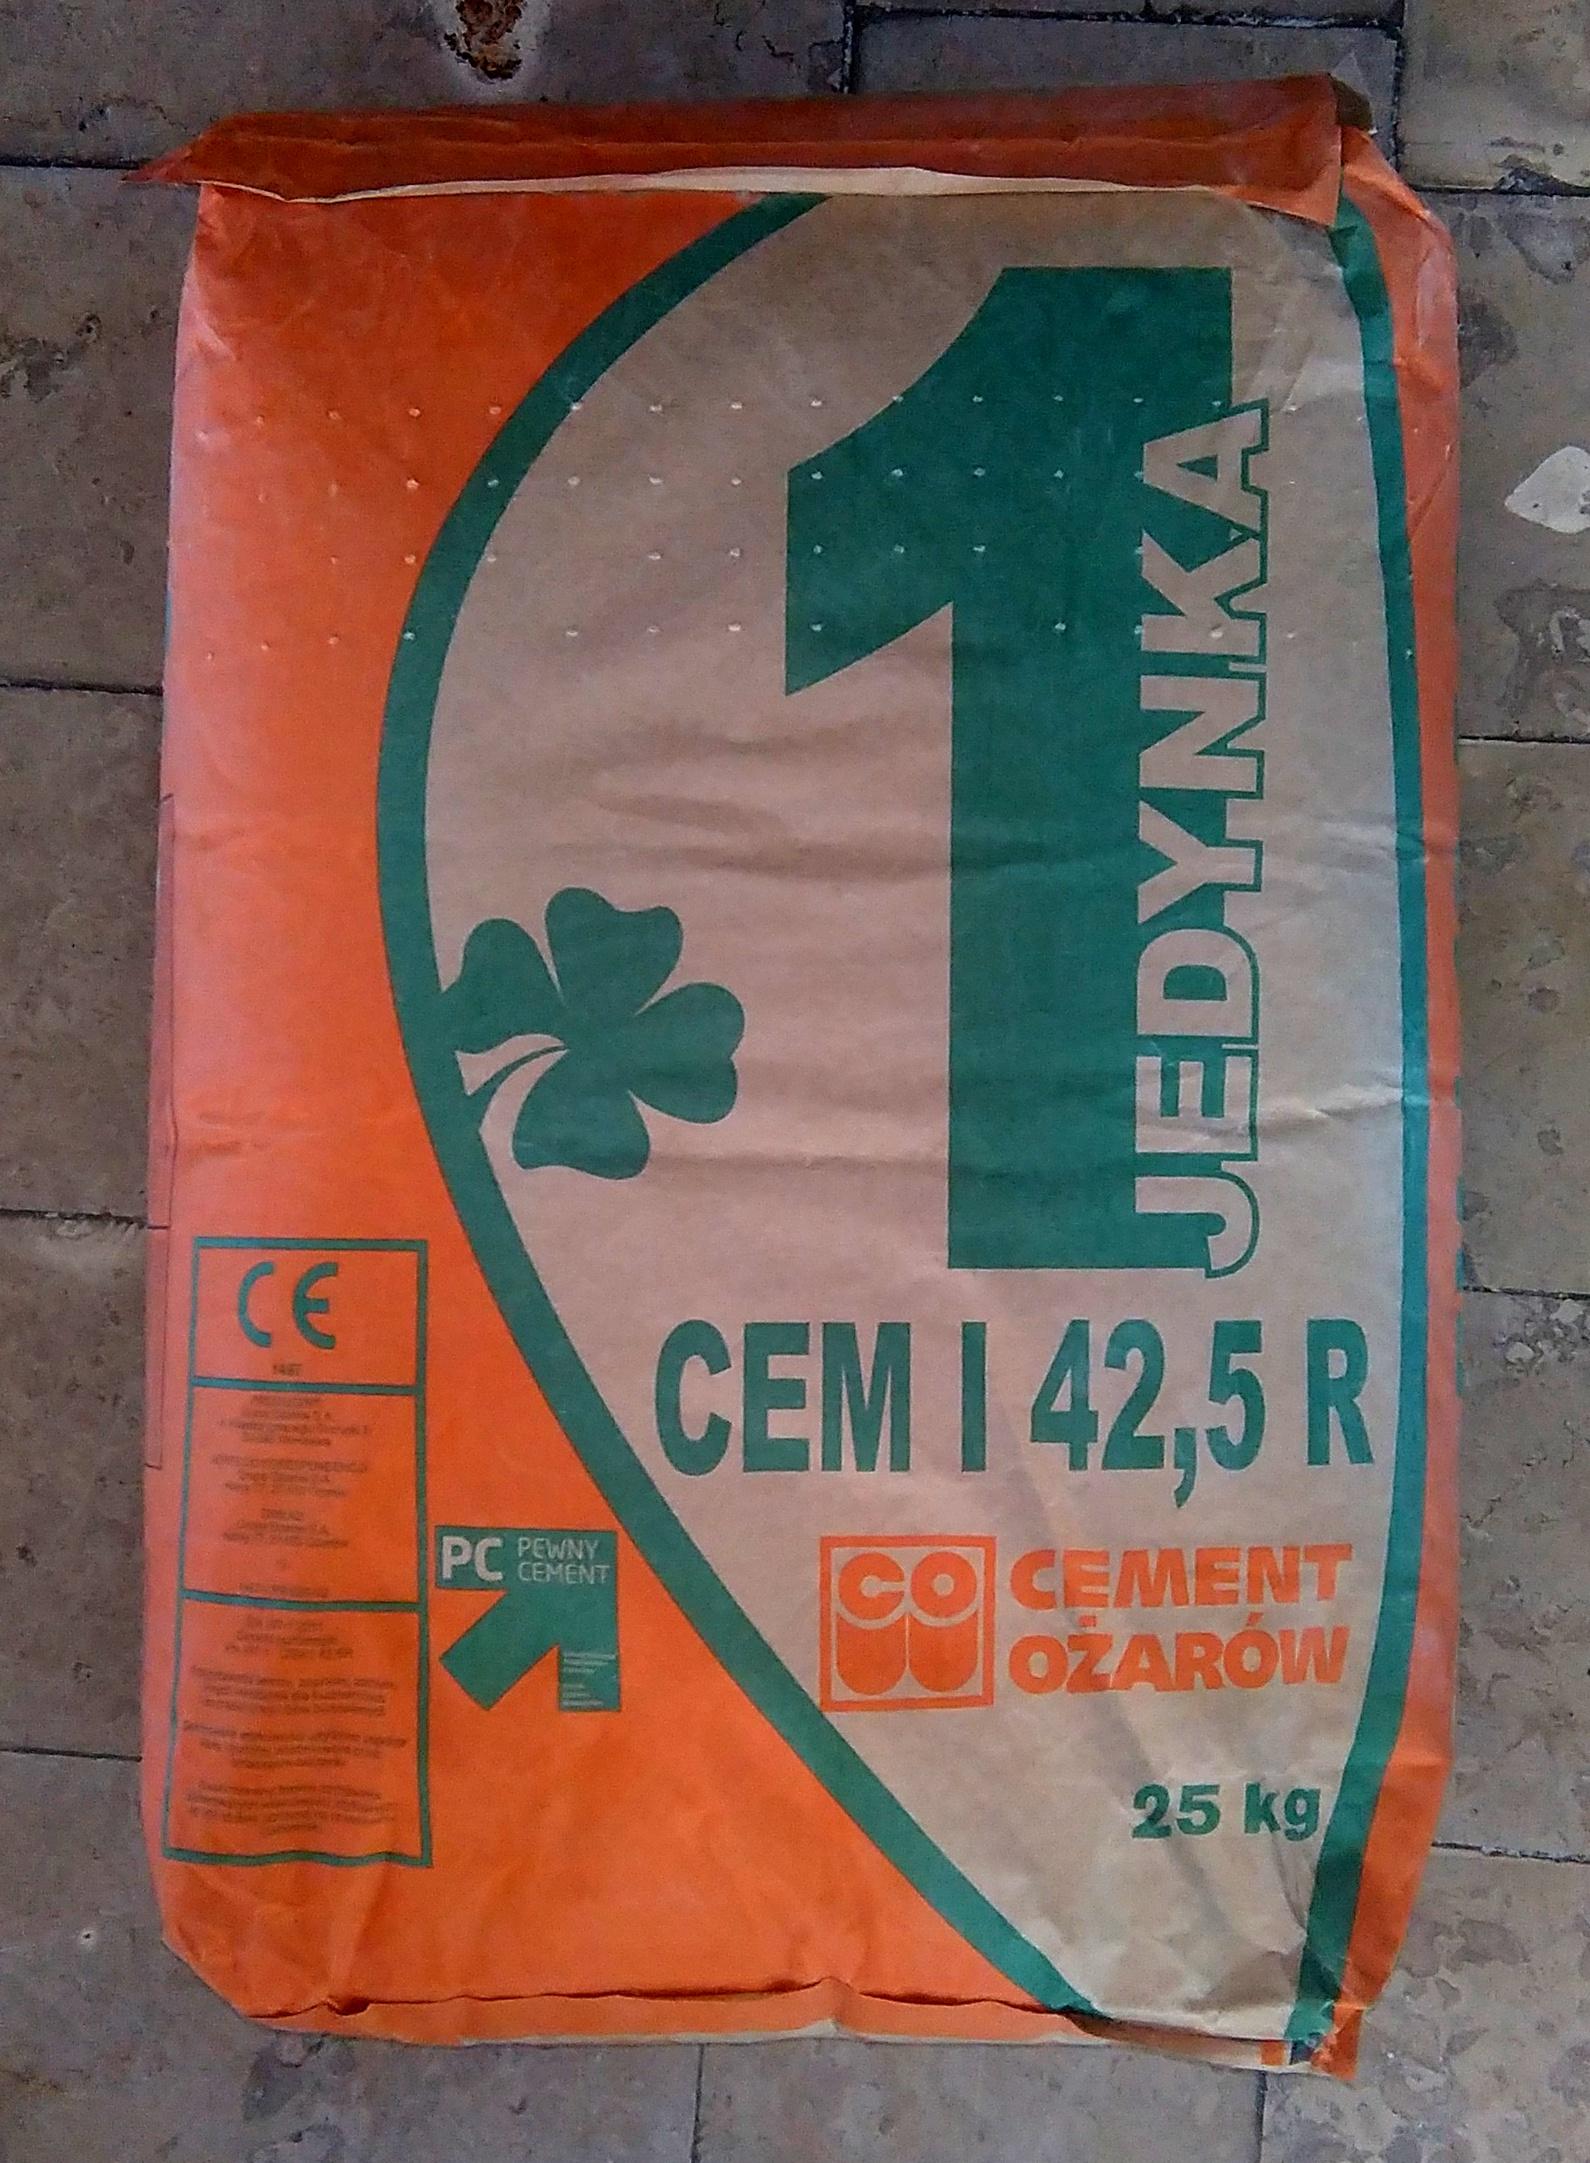 Portland Cement Bags : Plik portland cement cem i r bag g wikipedia